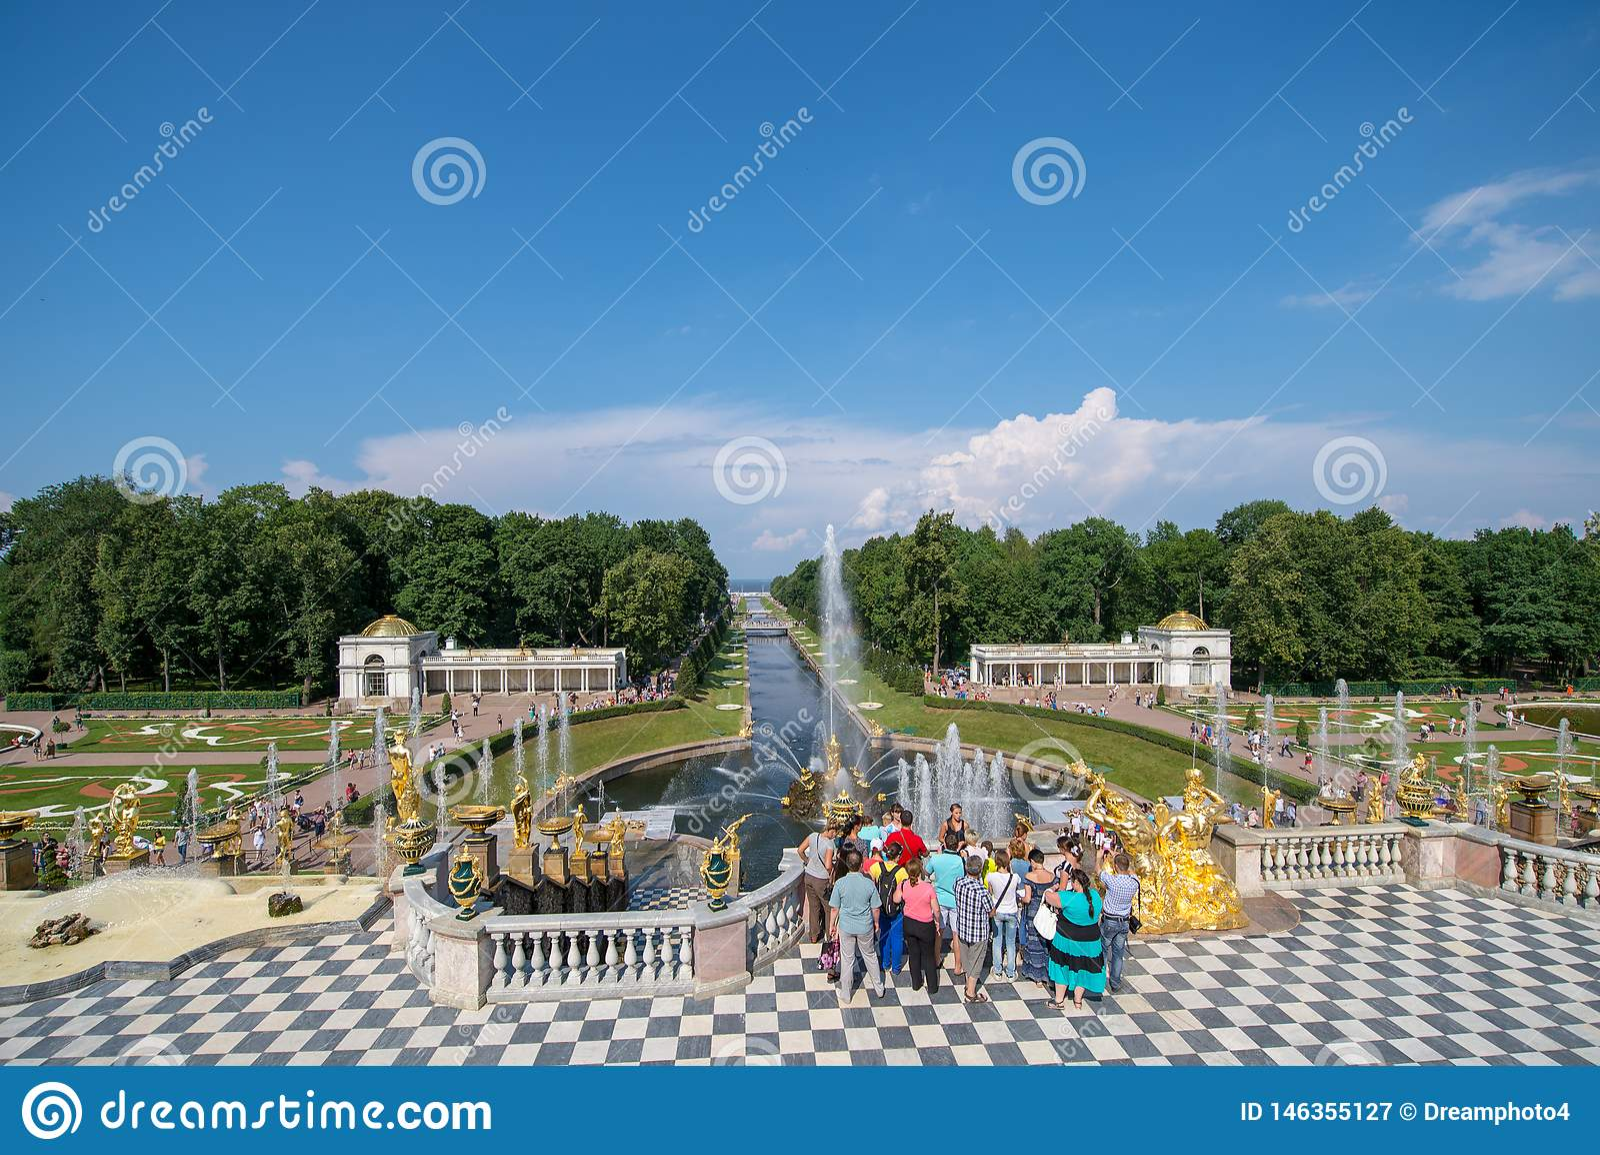 PETERHOF, RUSSIA, grande cascata in Pertergof, St Petersburg i più grandi insiemi della fontana nel mondo, comprendente